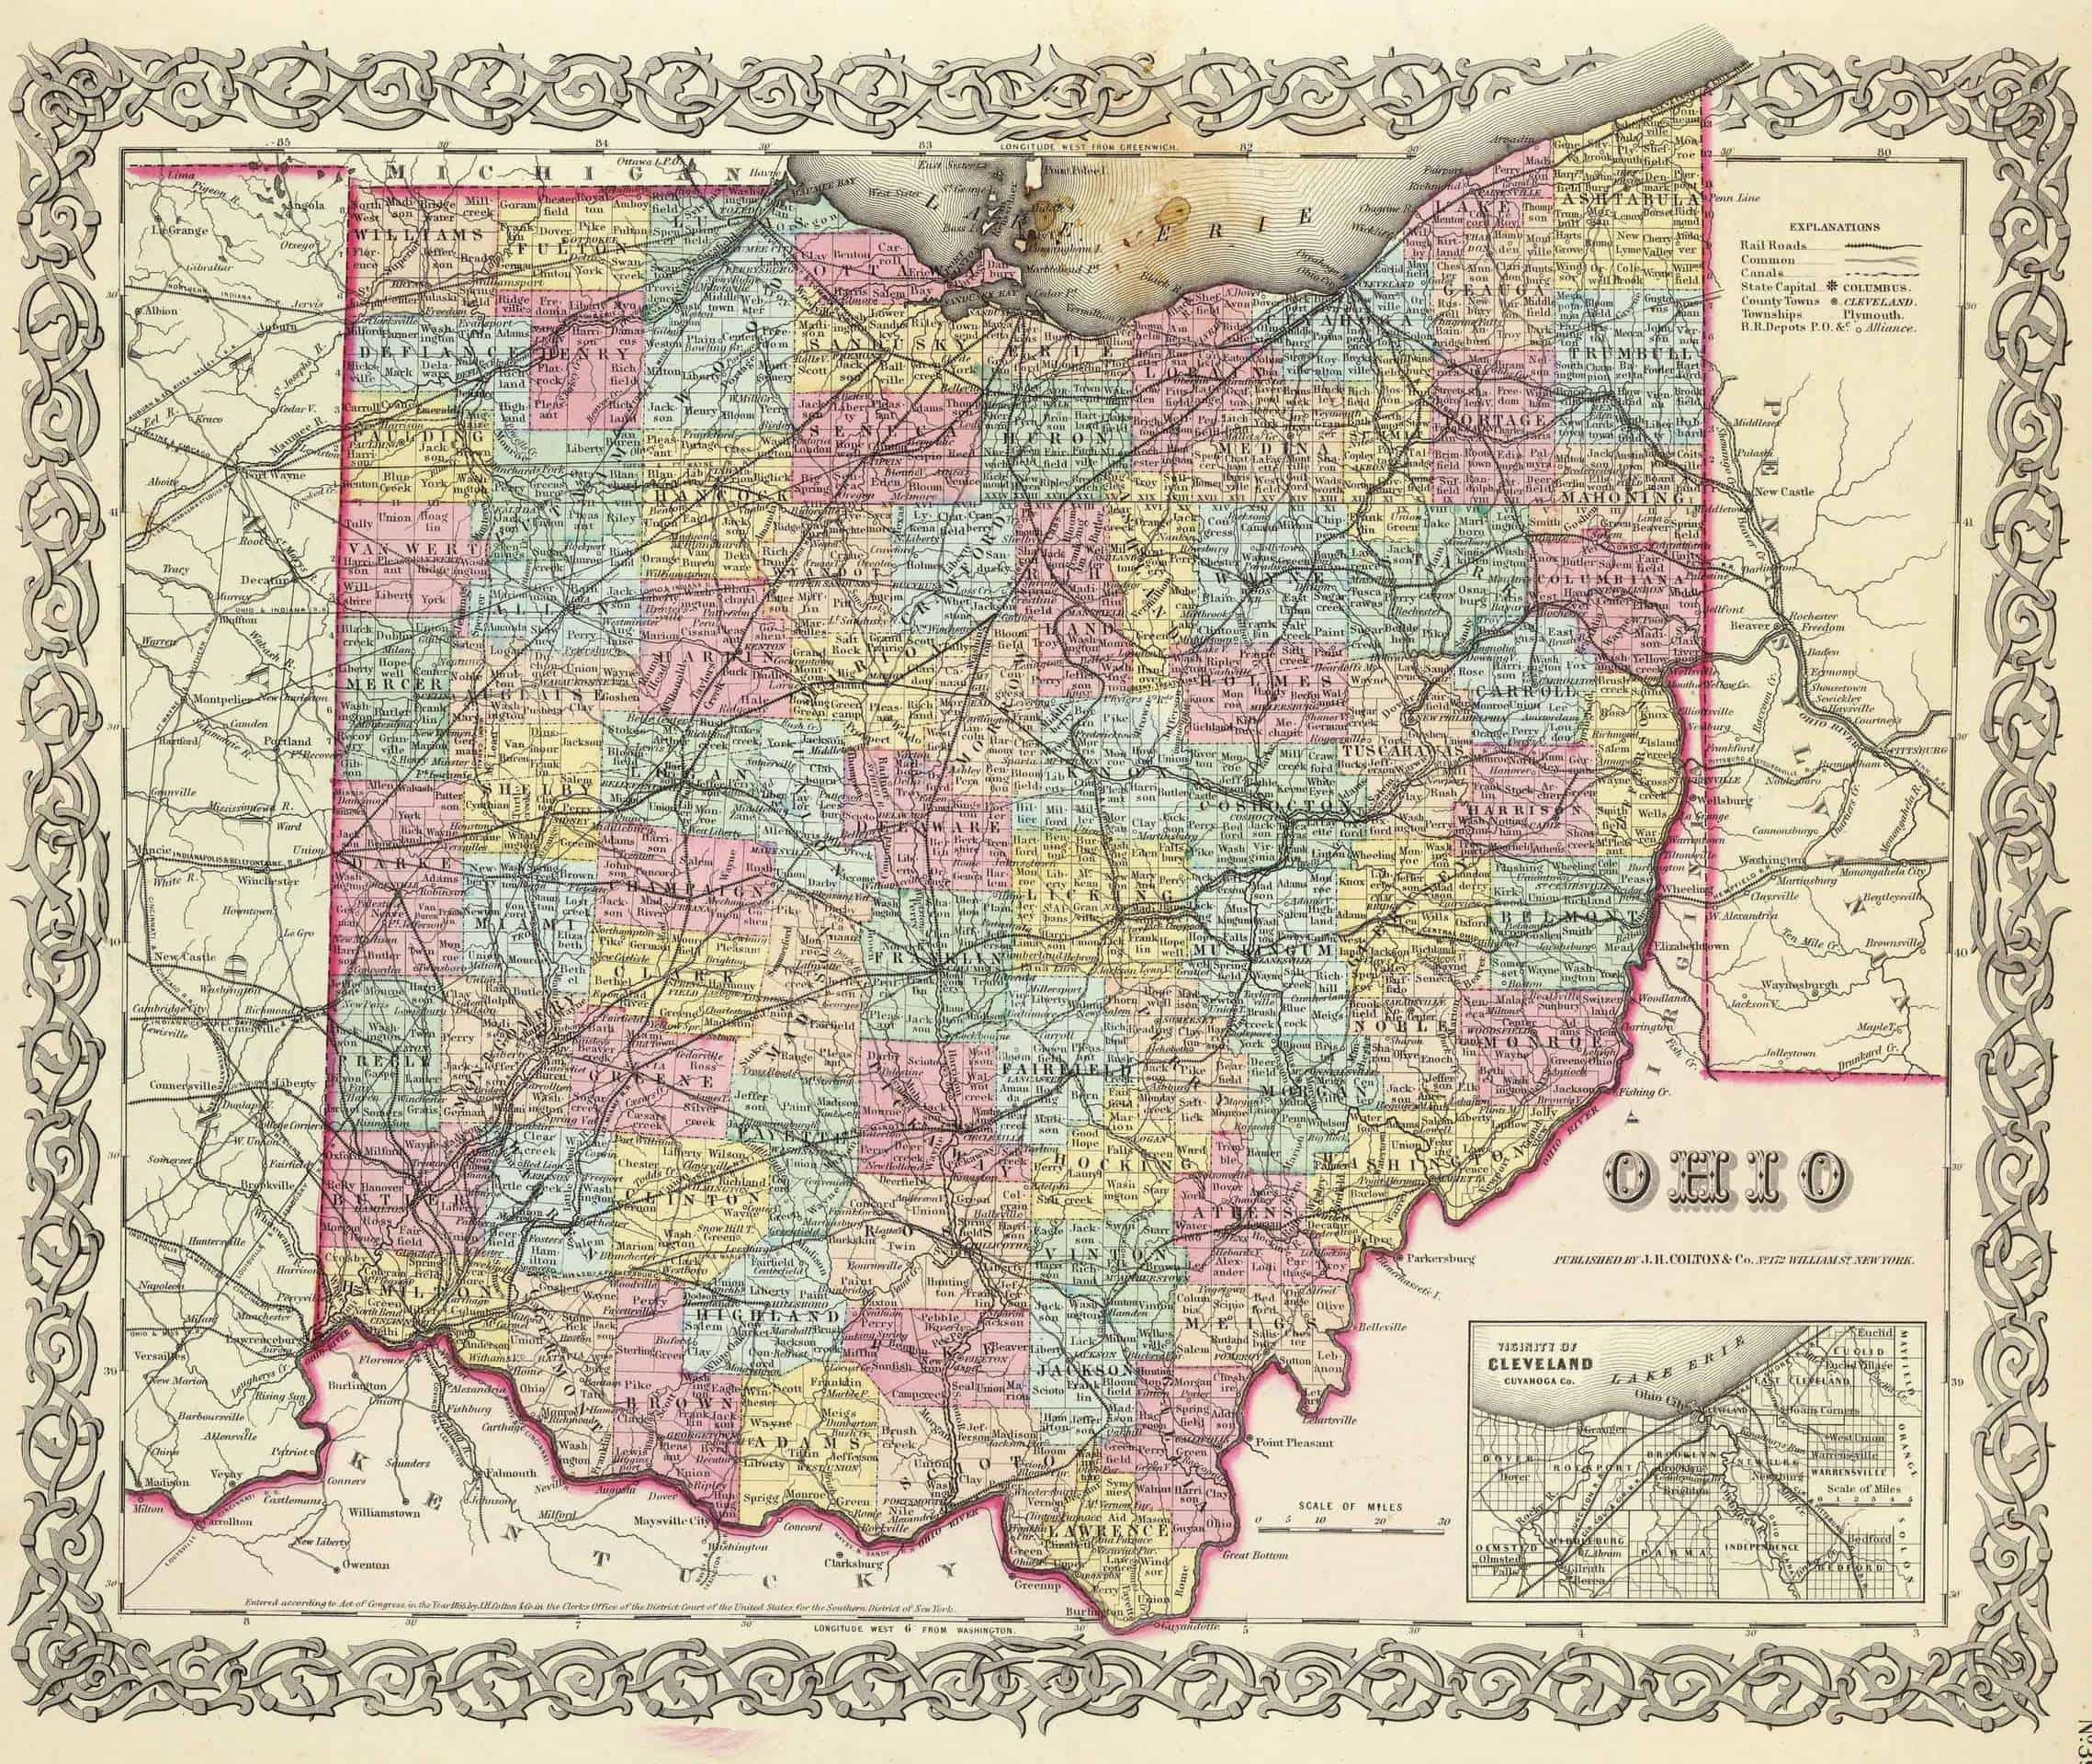 1856) Sara G. Stanley Addresses The Convention Of ... on map of illinois, oberlin ohio, map of michigan, map of italy, logan ohio, map of georgia, kent ohio, maumee ohio, list cities ohio, map of virginia, grove city ohio, youngstown ohio, middletown ohio, map of north carolina, map of california, map of usa, cities in ohio, map of maine, map of arizona, delaware ohio, kirtland ohio, defiance ohio, map of massachusetts, map of new york, mount vernon ohio, google maps ohio, map of oklahoma, wooster ohio, map of china, medina ohio, marion ohio, map of alaska, map of new jersey, map of texas, map of delaware, map of mexico, counties in ohio, solon ohio, wapakoneta ohio,